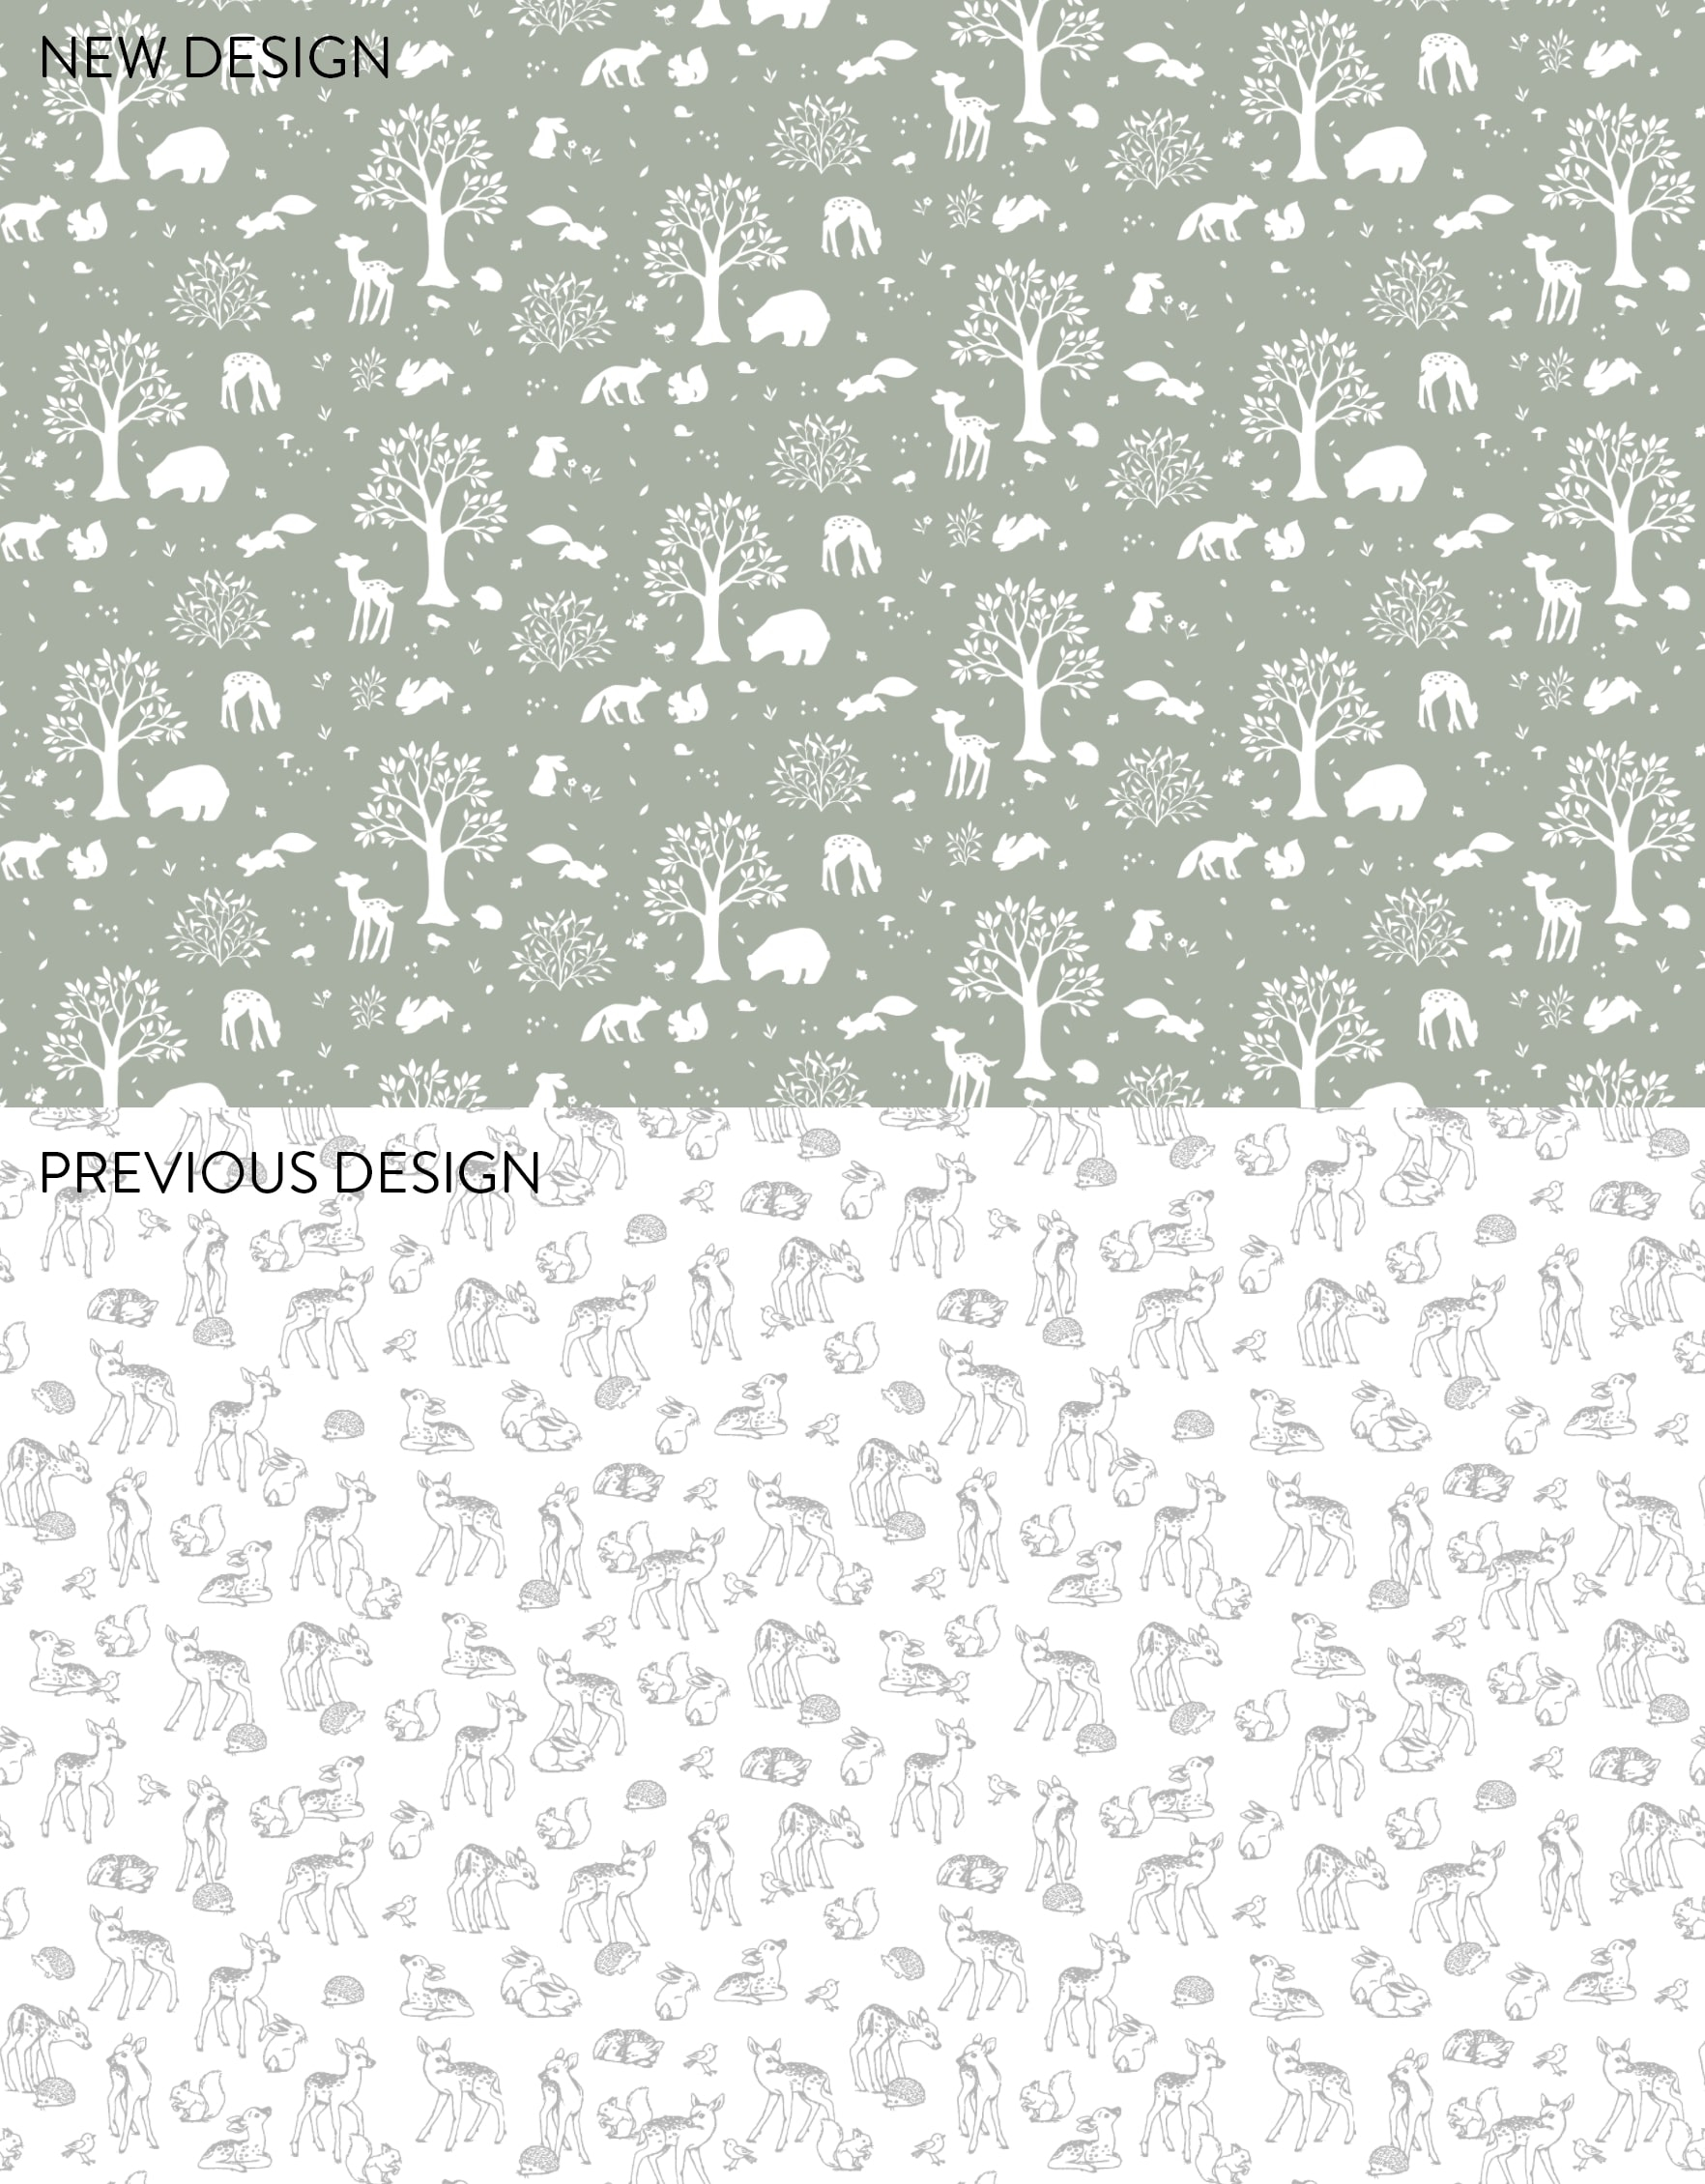 Nina Stajner's latest custom tissue paper design